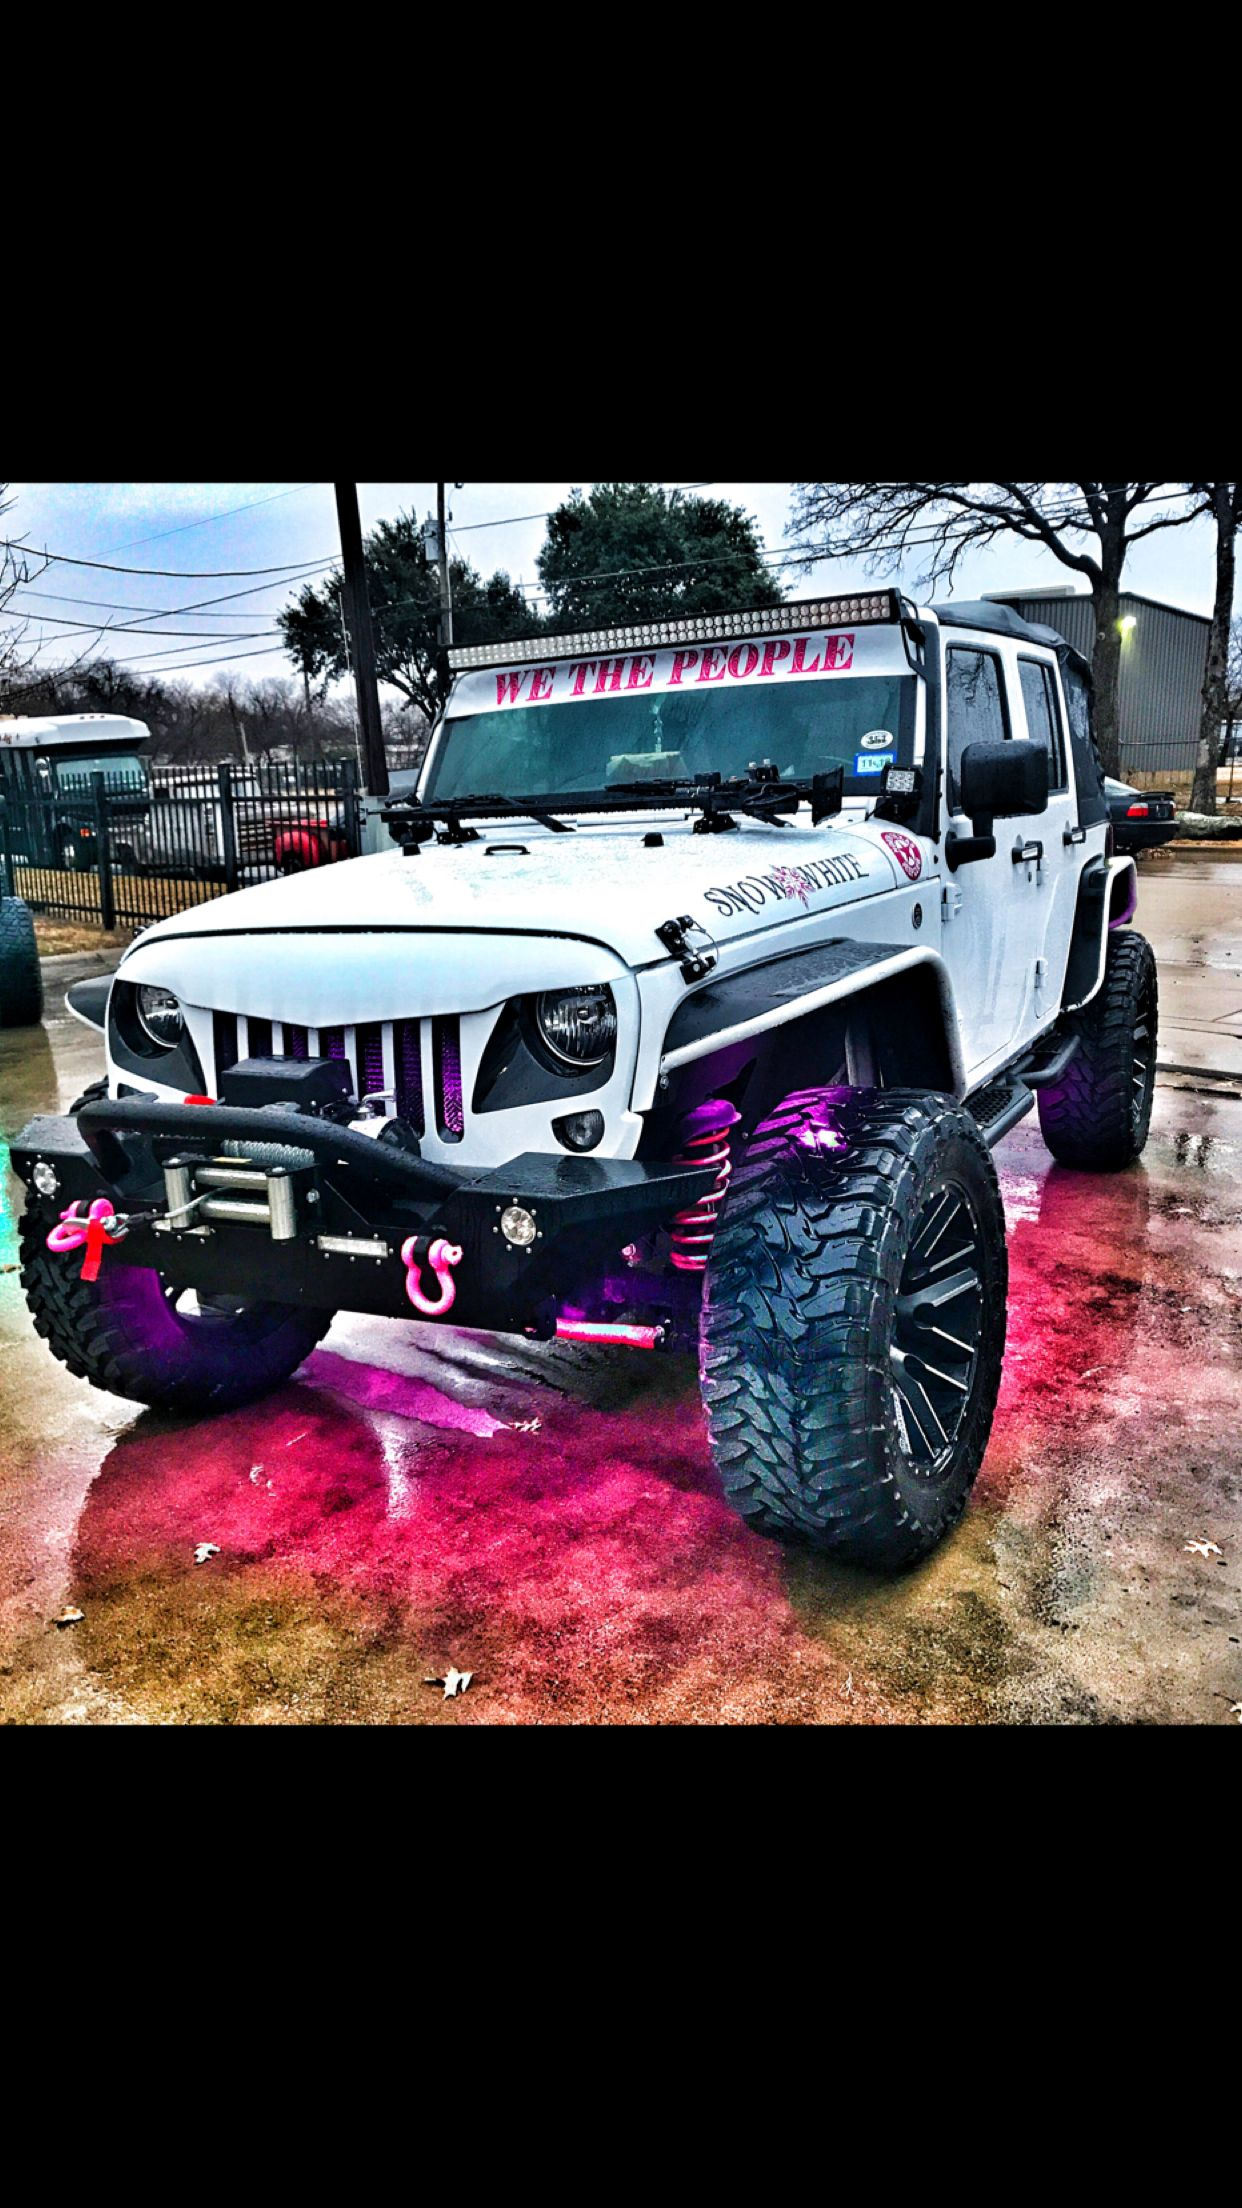 Pin On My Jeep Addiction